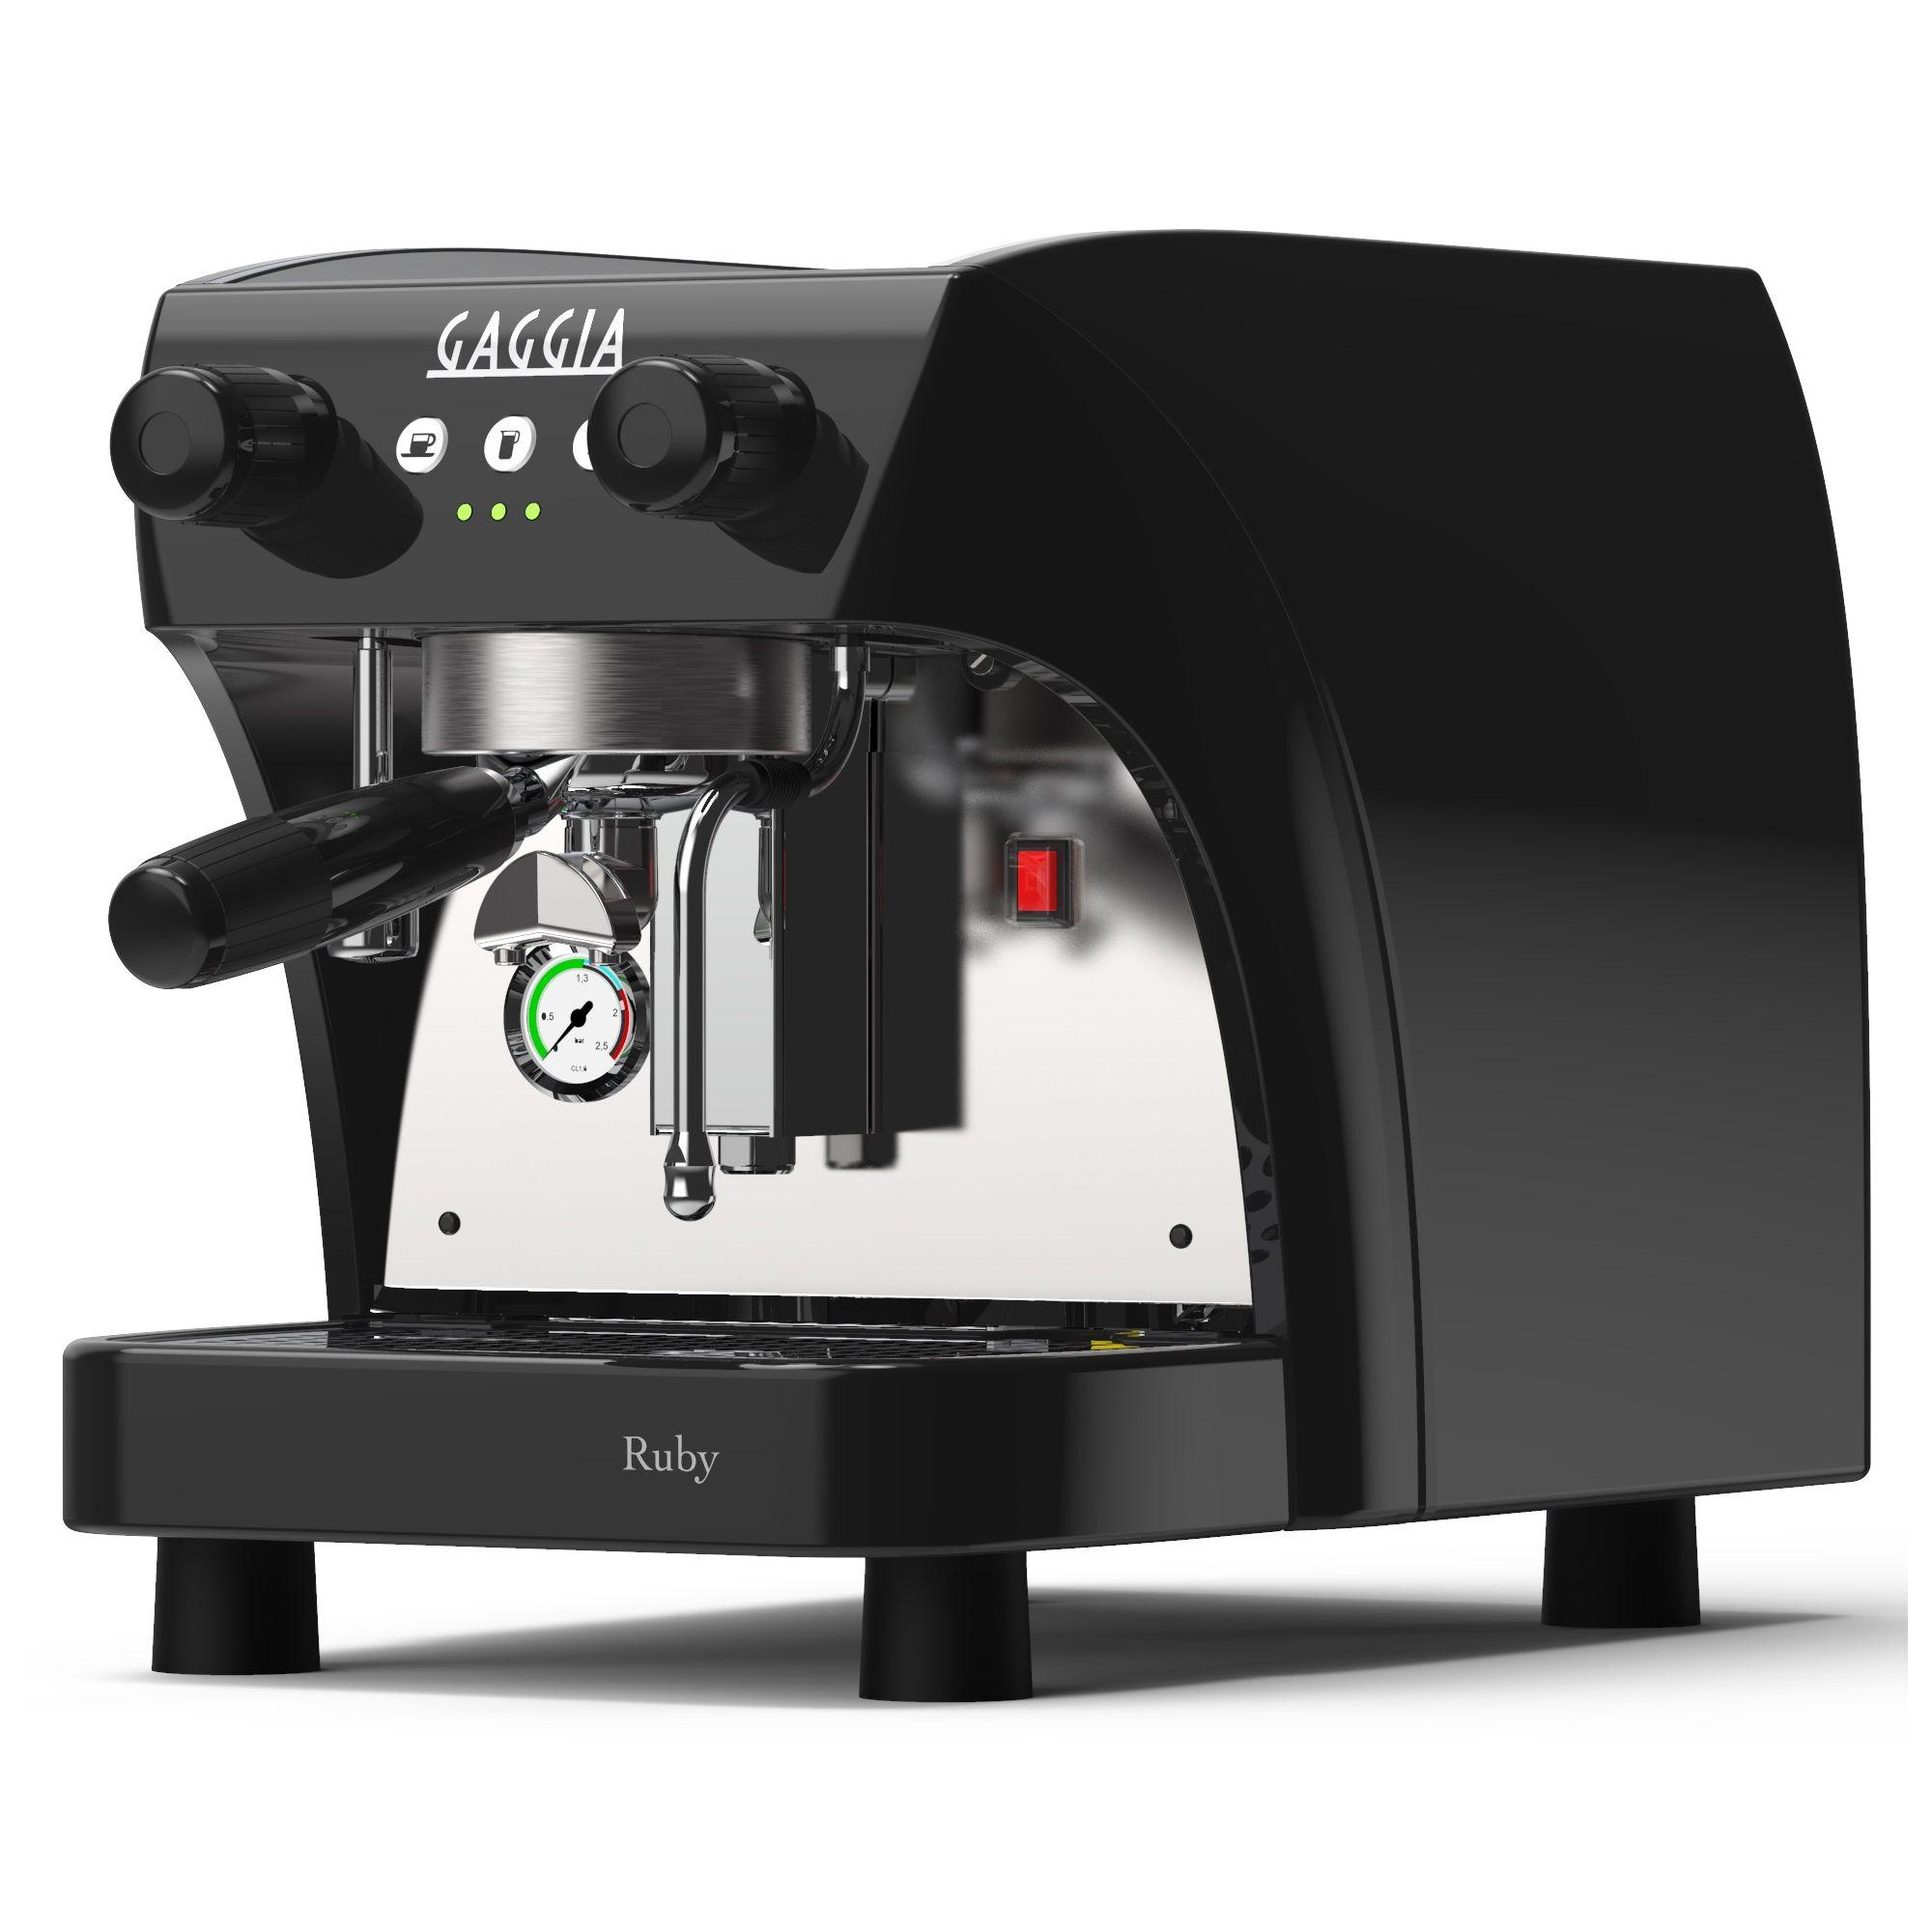 Gaggia Ruby Espresso Coffee Machine